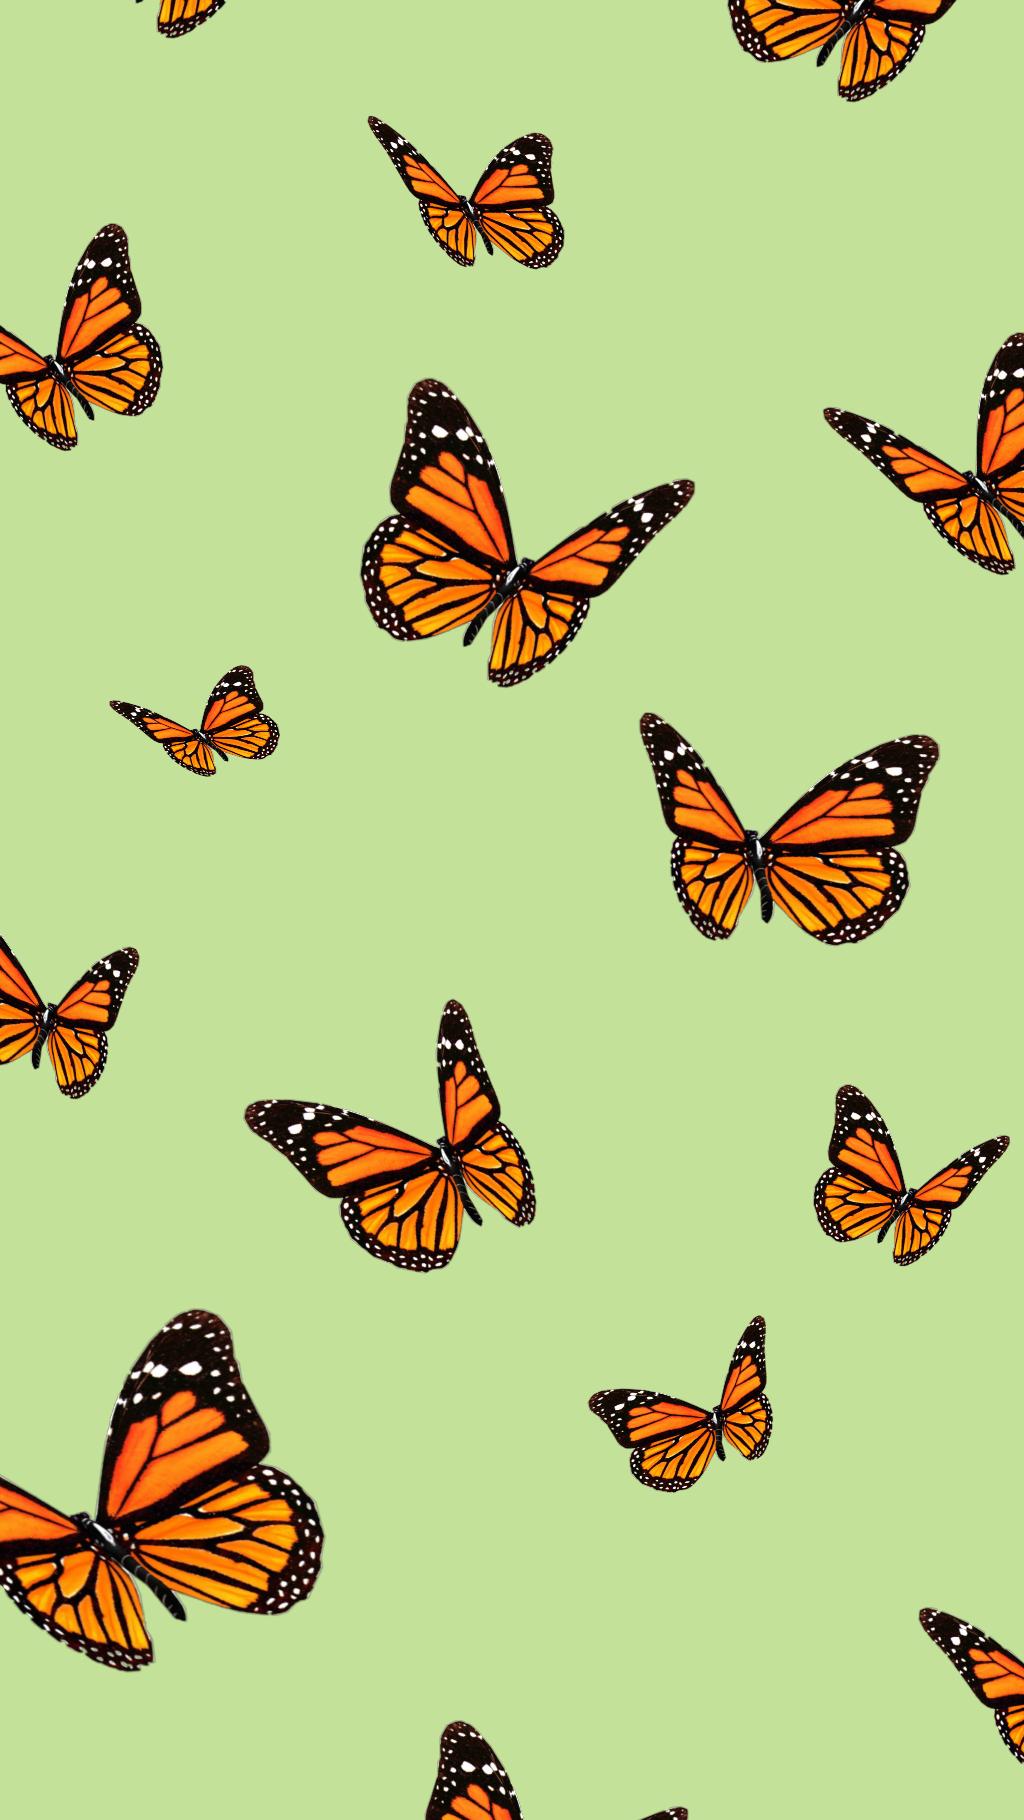 Lockscreen Aesthetic Iphone Wallpapers Butterfly Wallpaper Iphone Aesthetic Iphone Wallpaper Butterfly Wallpaper